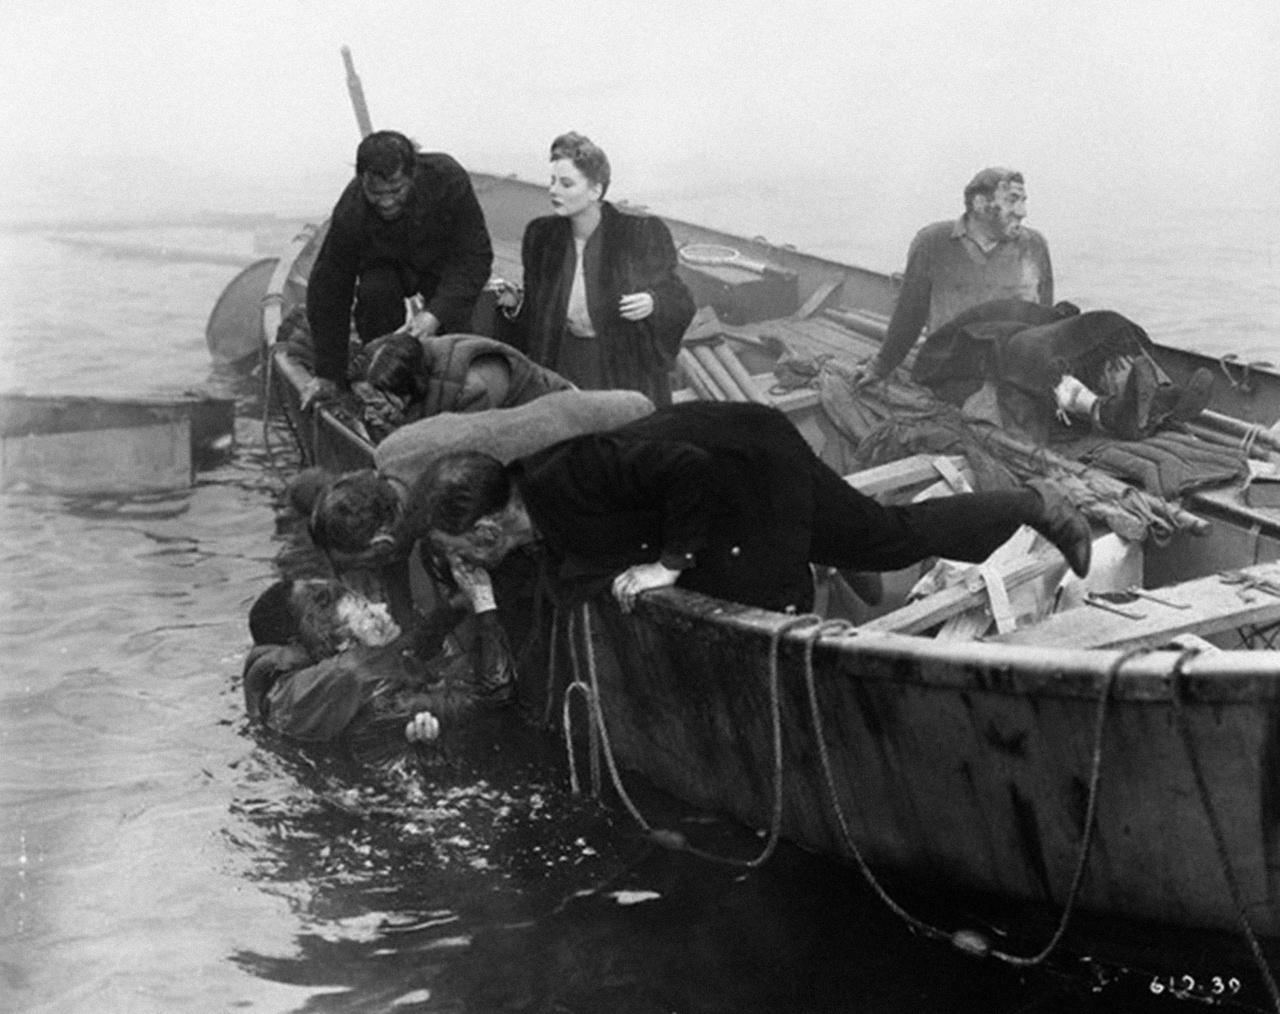 Prigionieri dell'oceano (Lifeboat) 1944